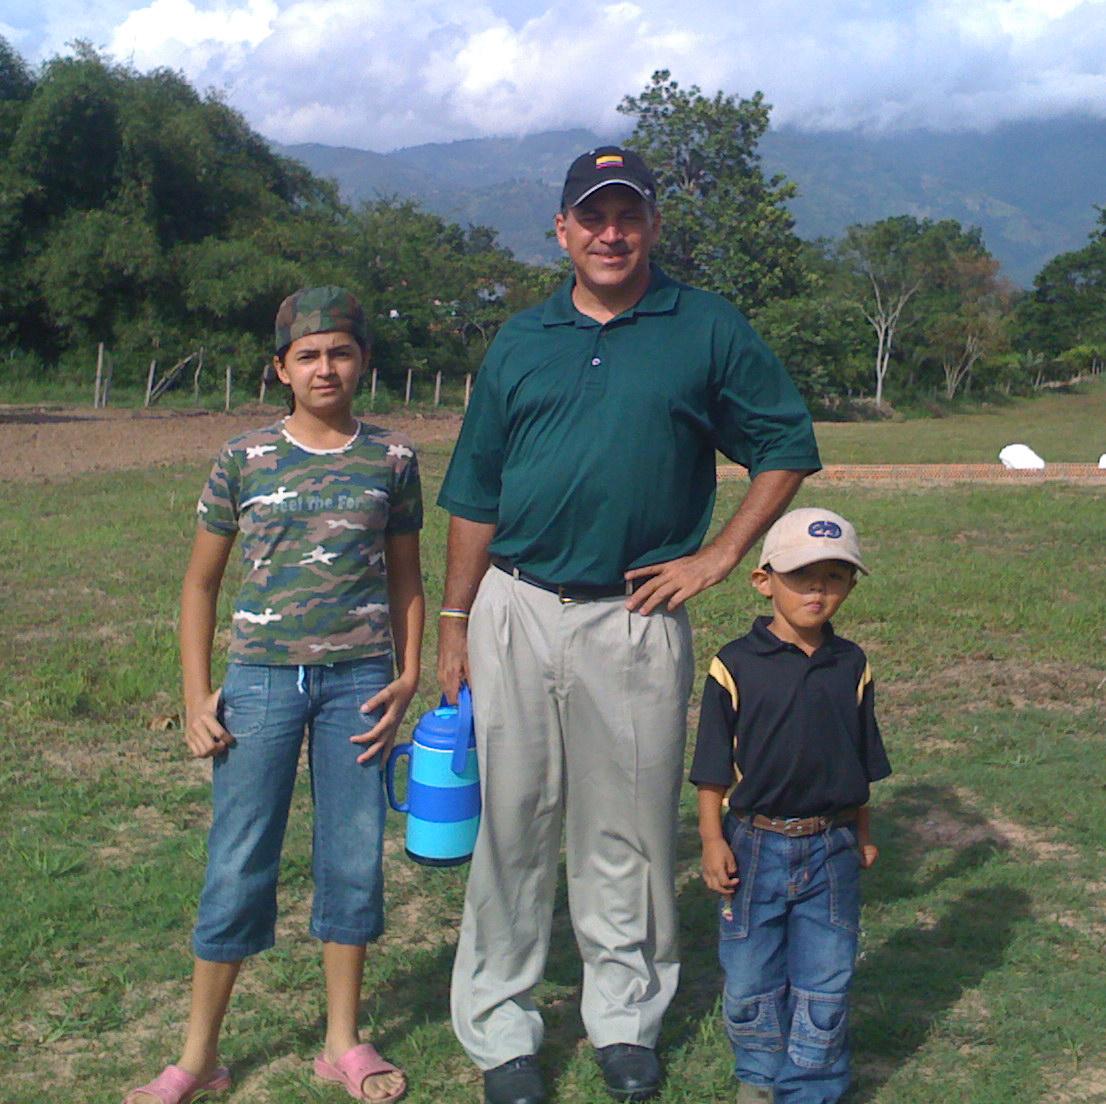 Anthony Ciabattoni with two aspiring golfers.